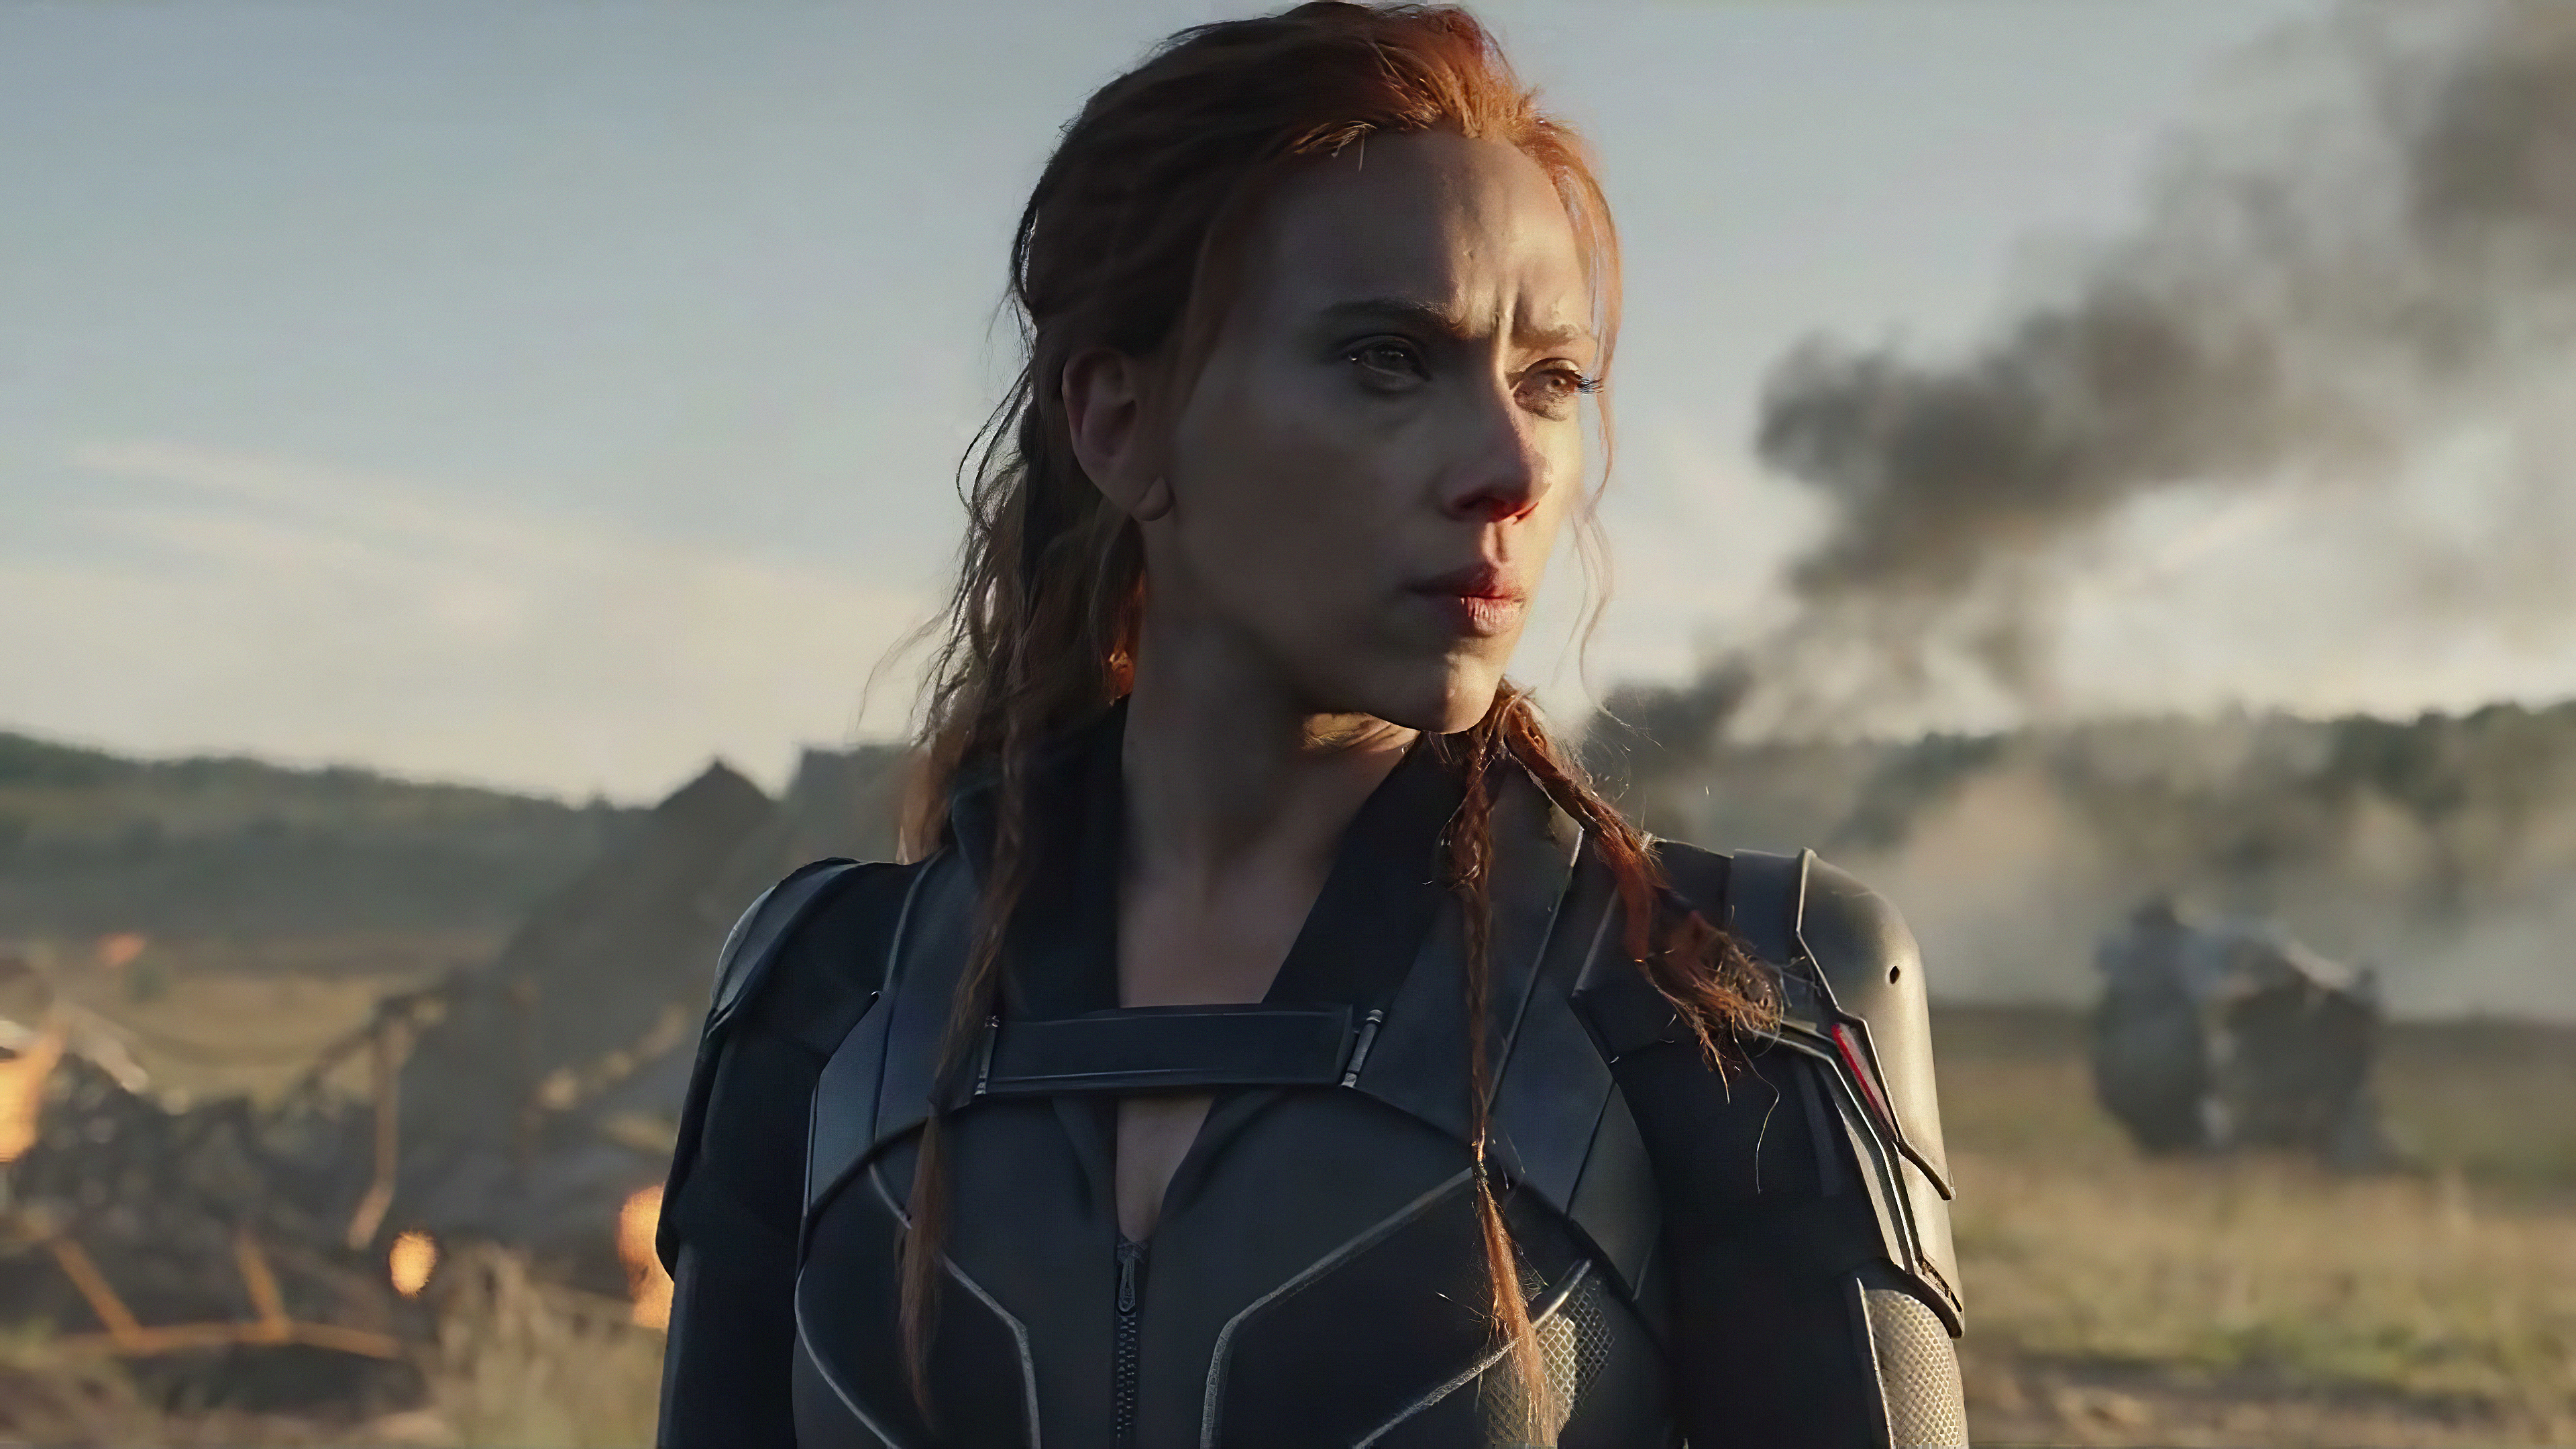 Black Widow 2020 4k Hd Movies 4k Wallpapers Images